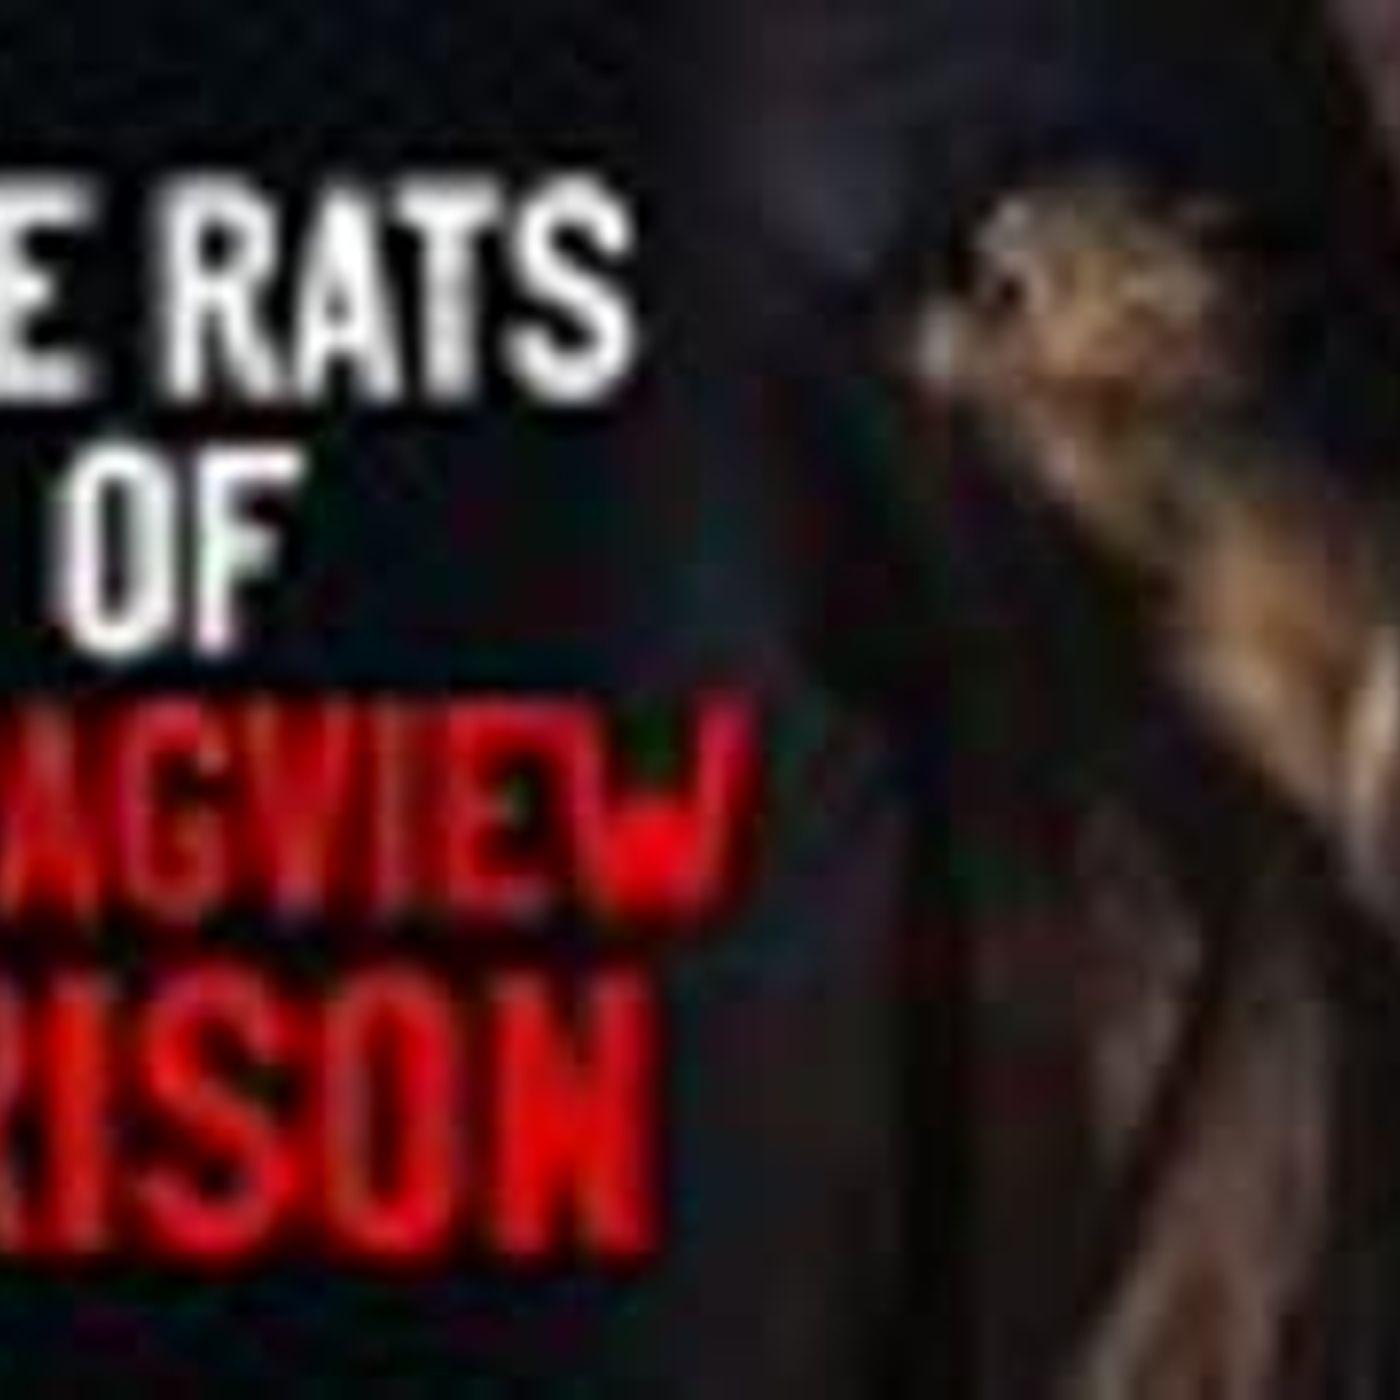 """The Rats Of Stragview Prison"" Creepypasta"